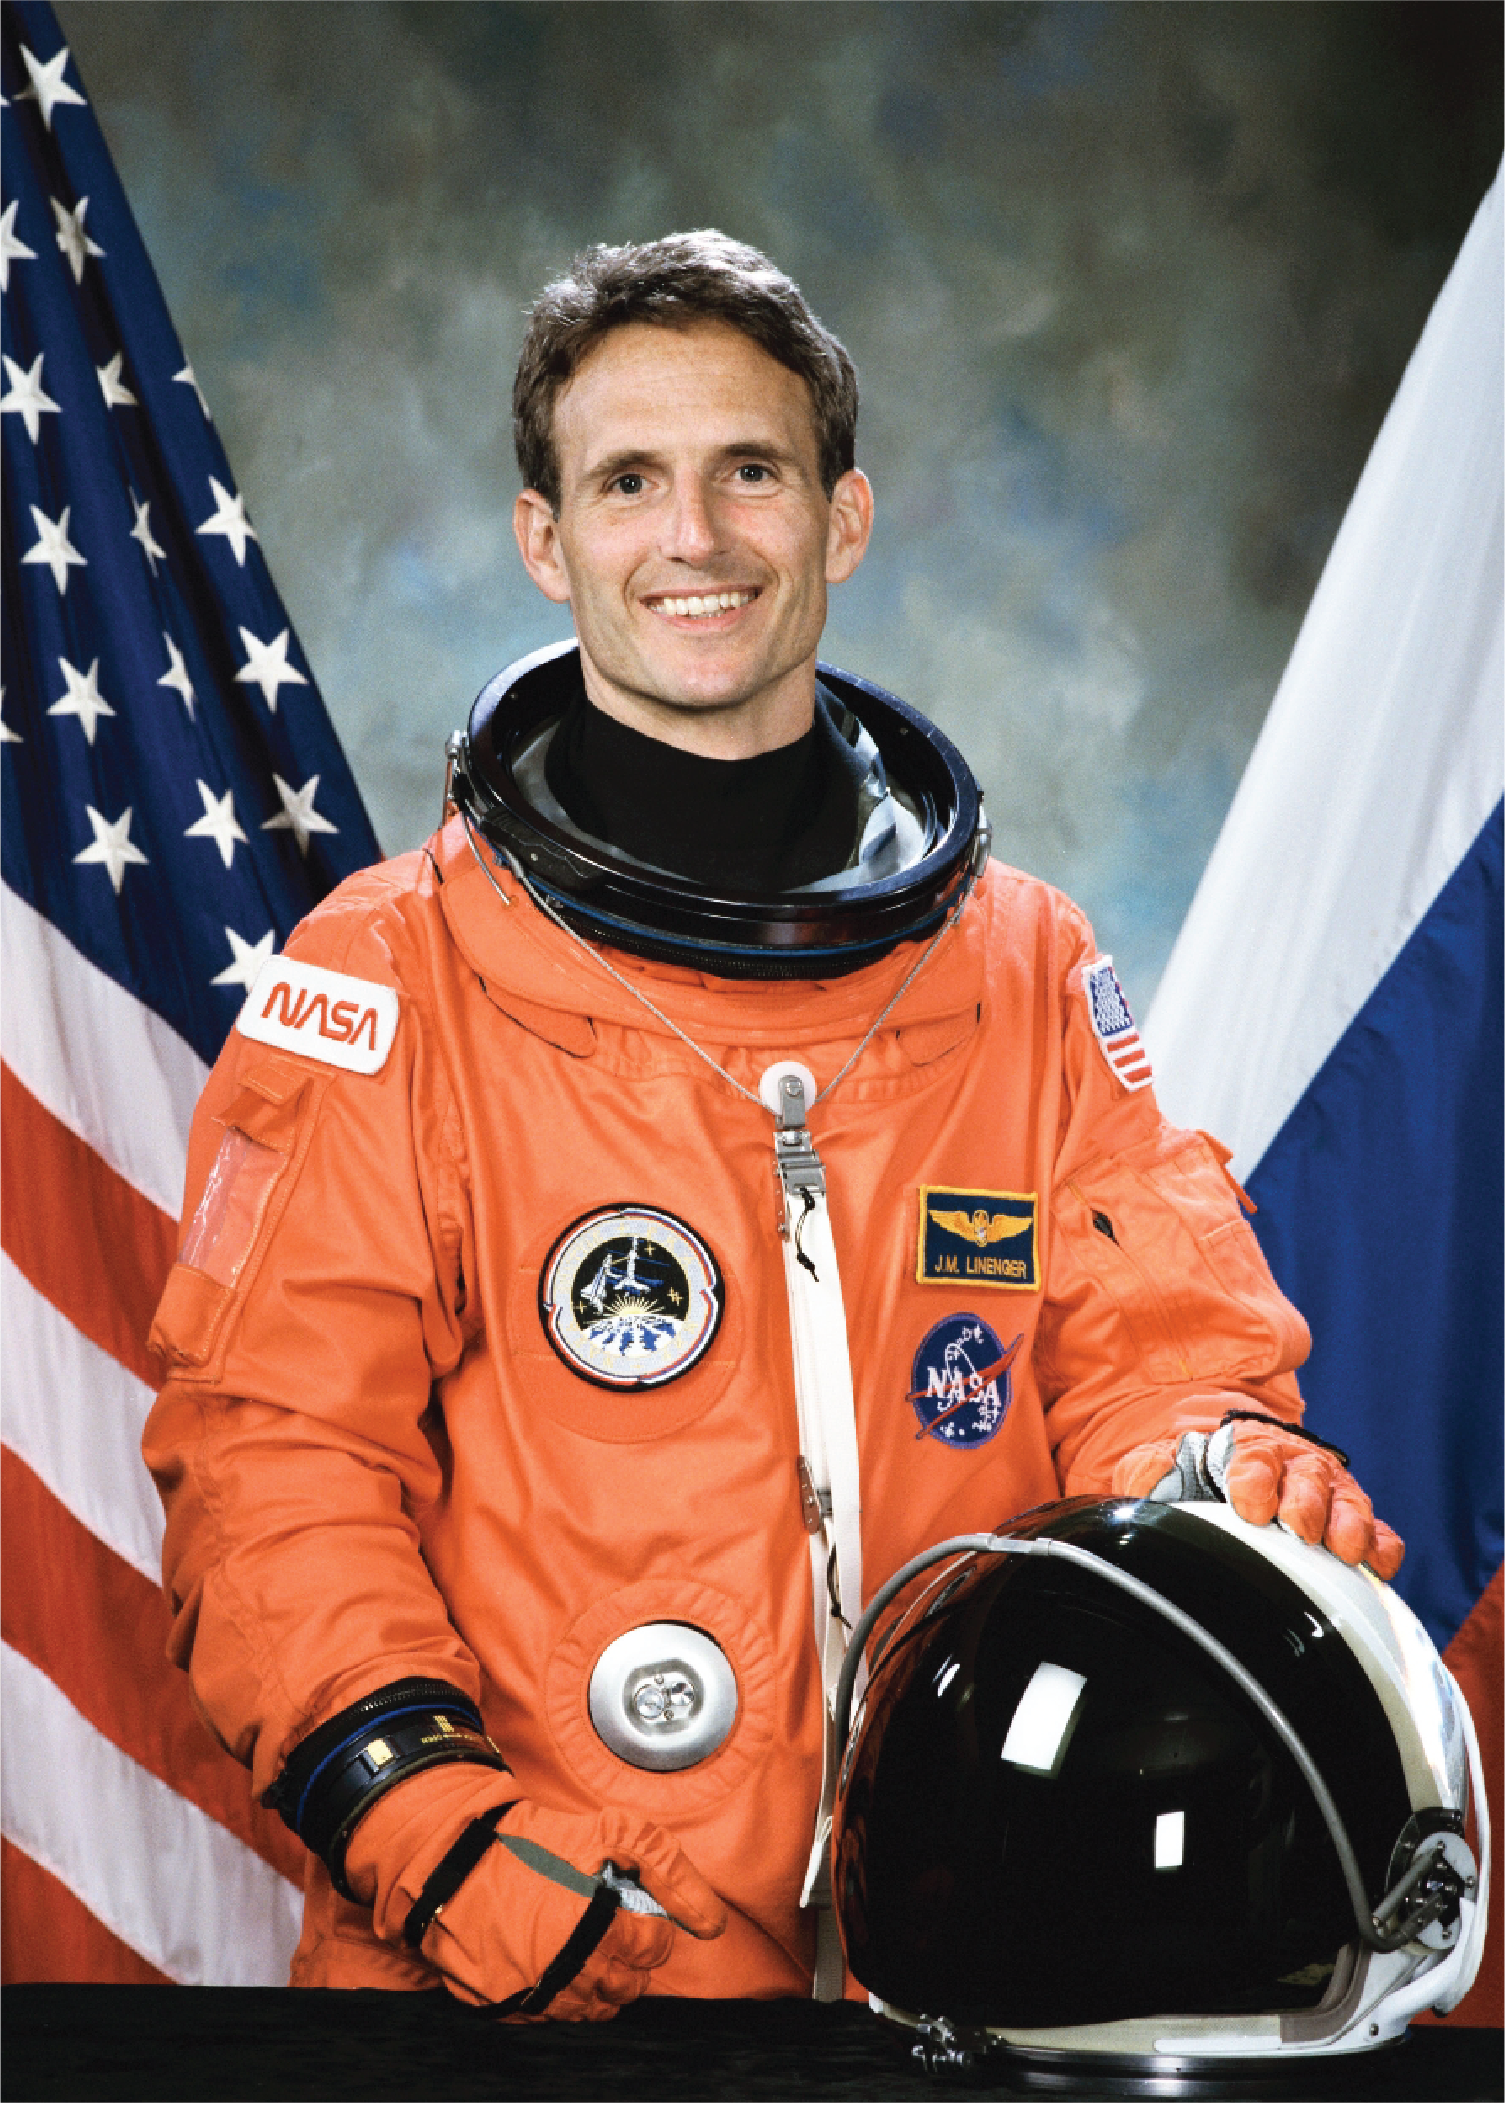 Astronaut J. M. Linenger, M.D.